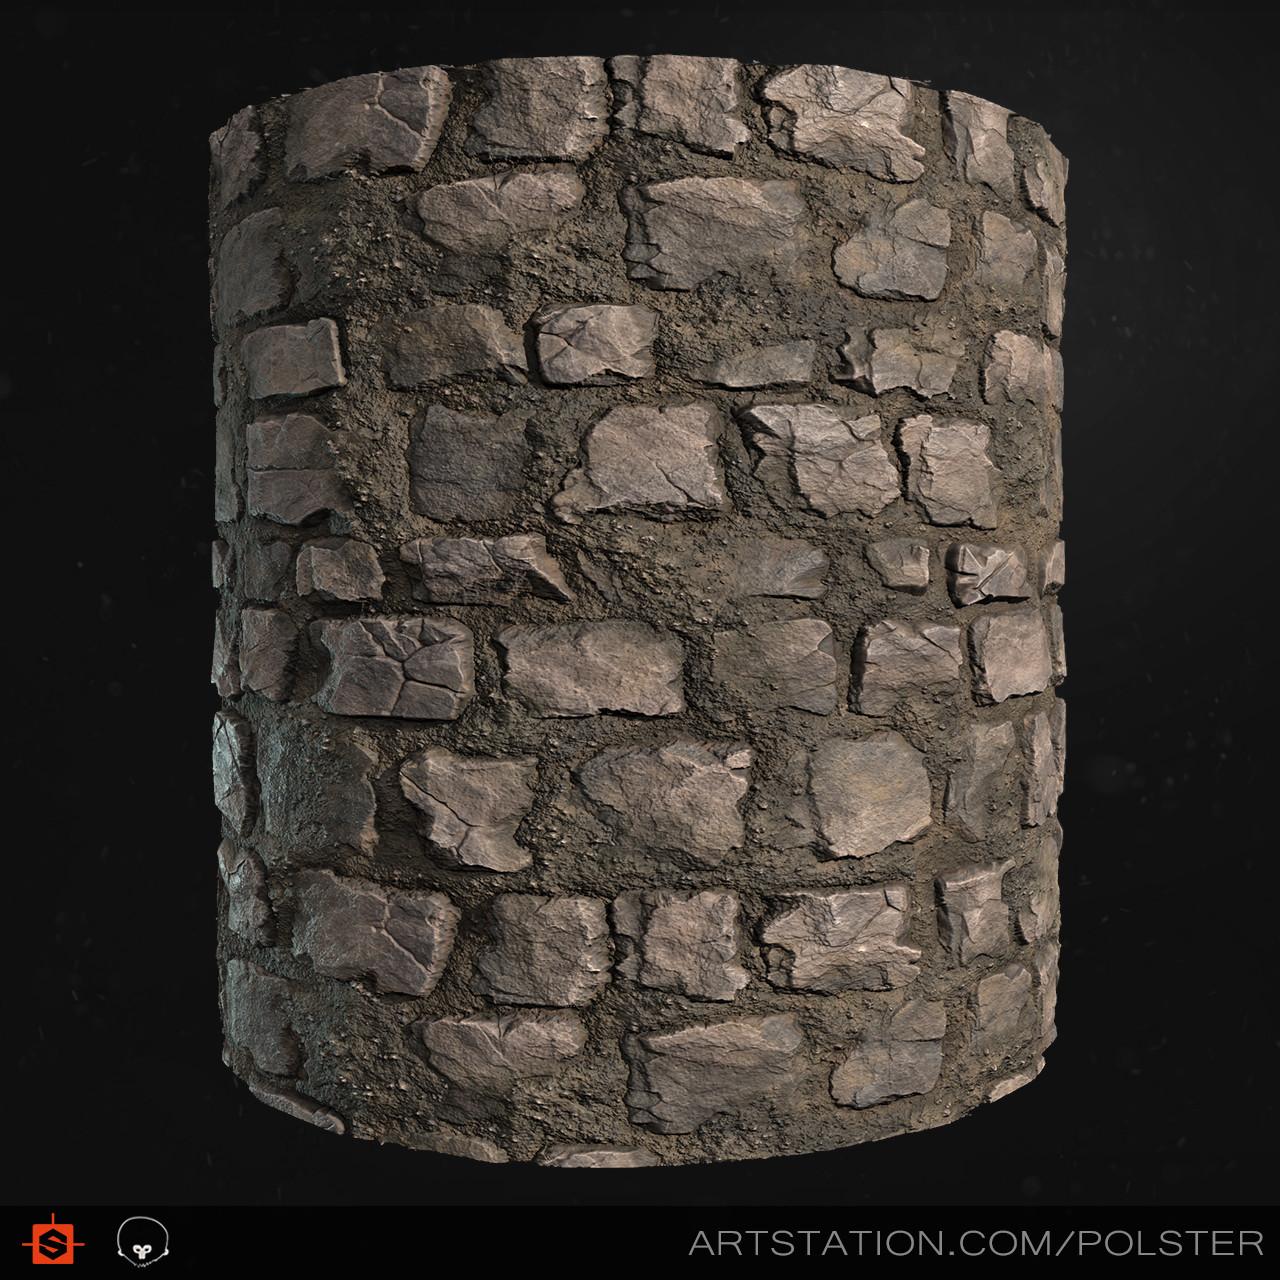 Stefan polster rough cobblestone cyl c